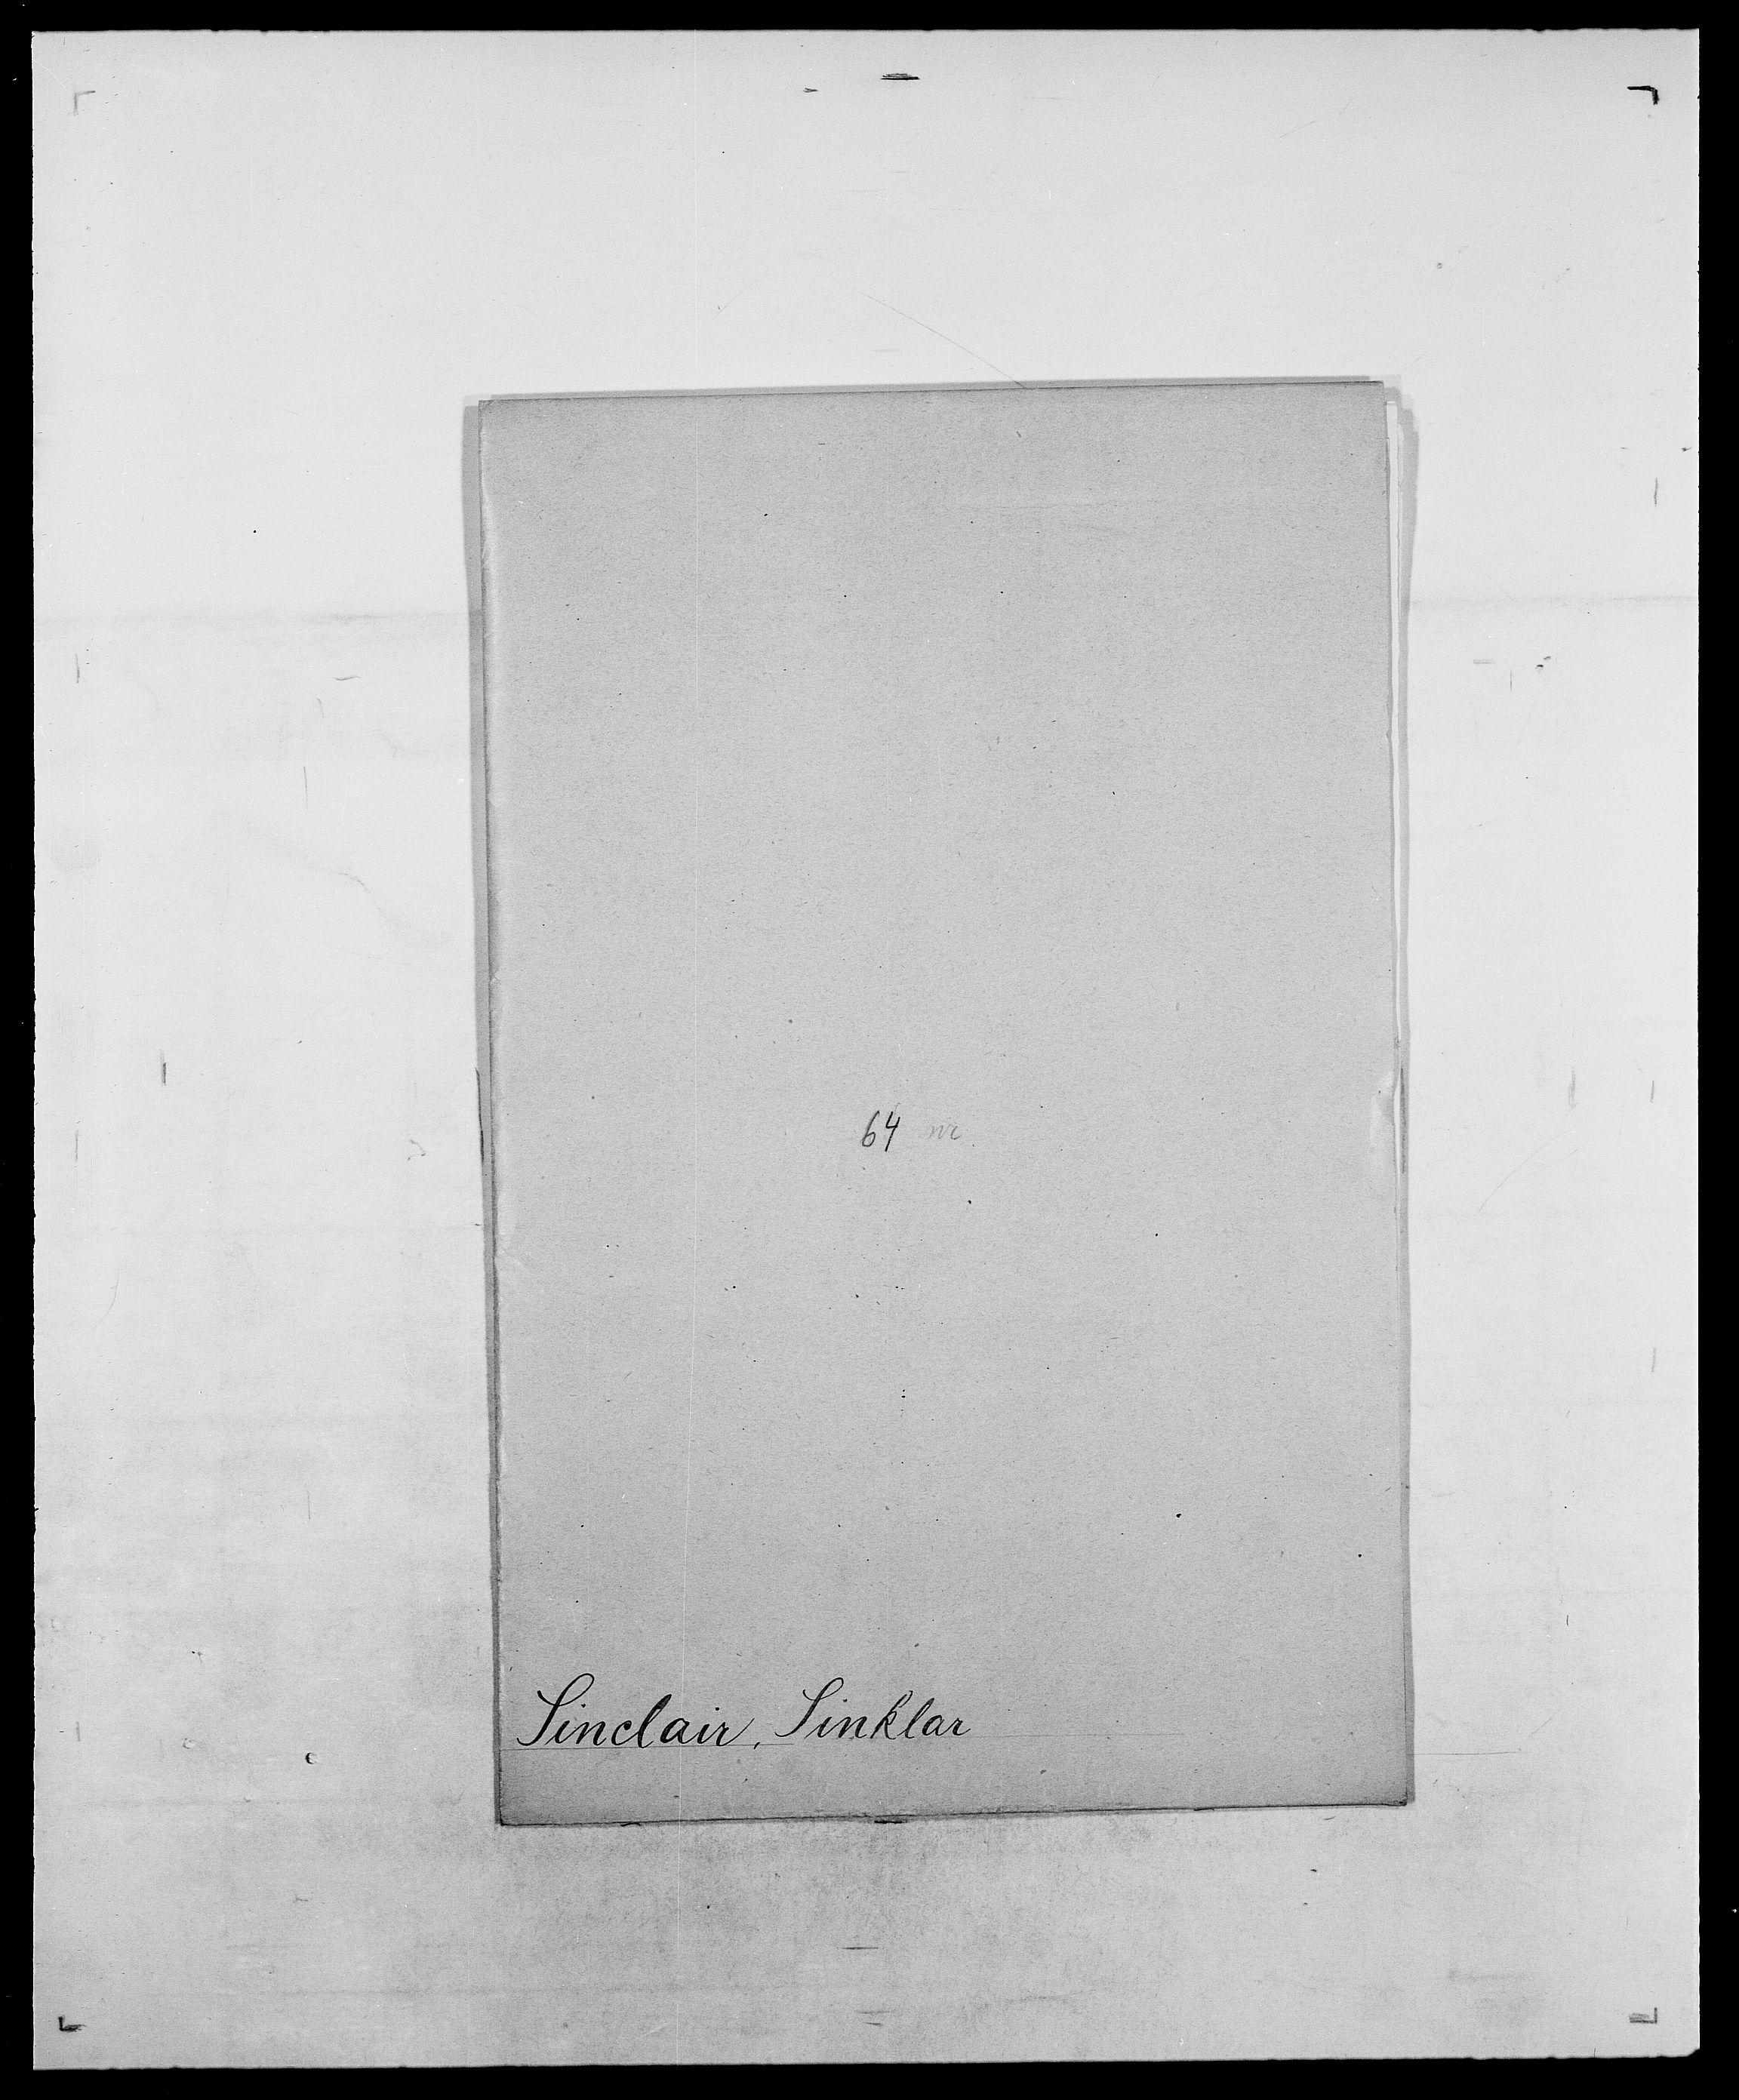 SAO, Delgobe, Charles Antoine - samling, D/Da/L0035: Schnabel - sjetman, s. 827